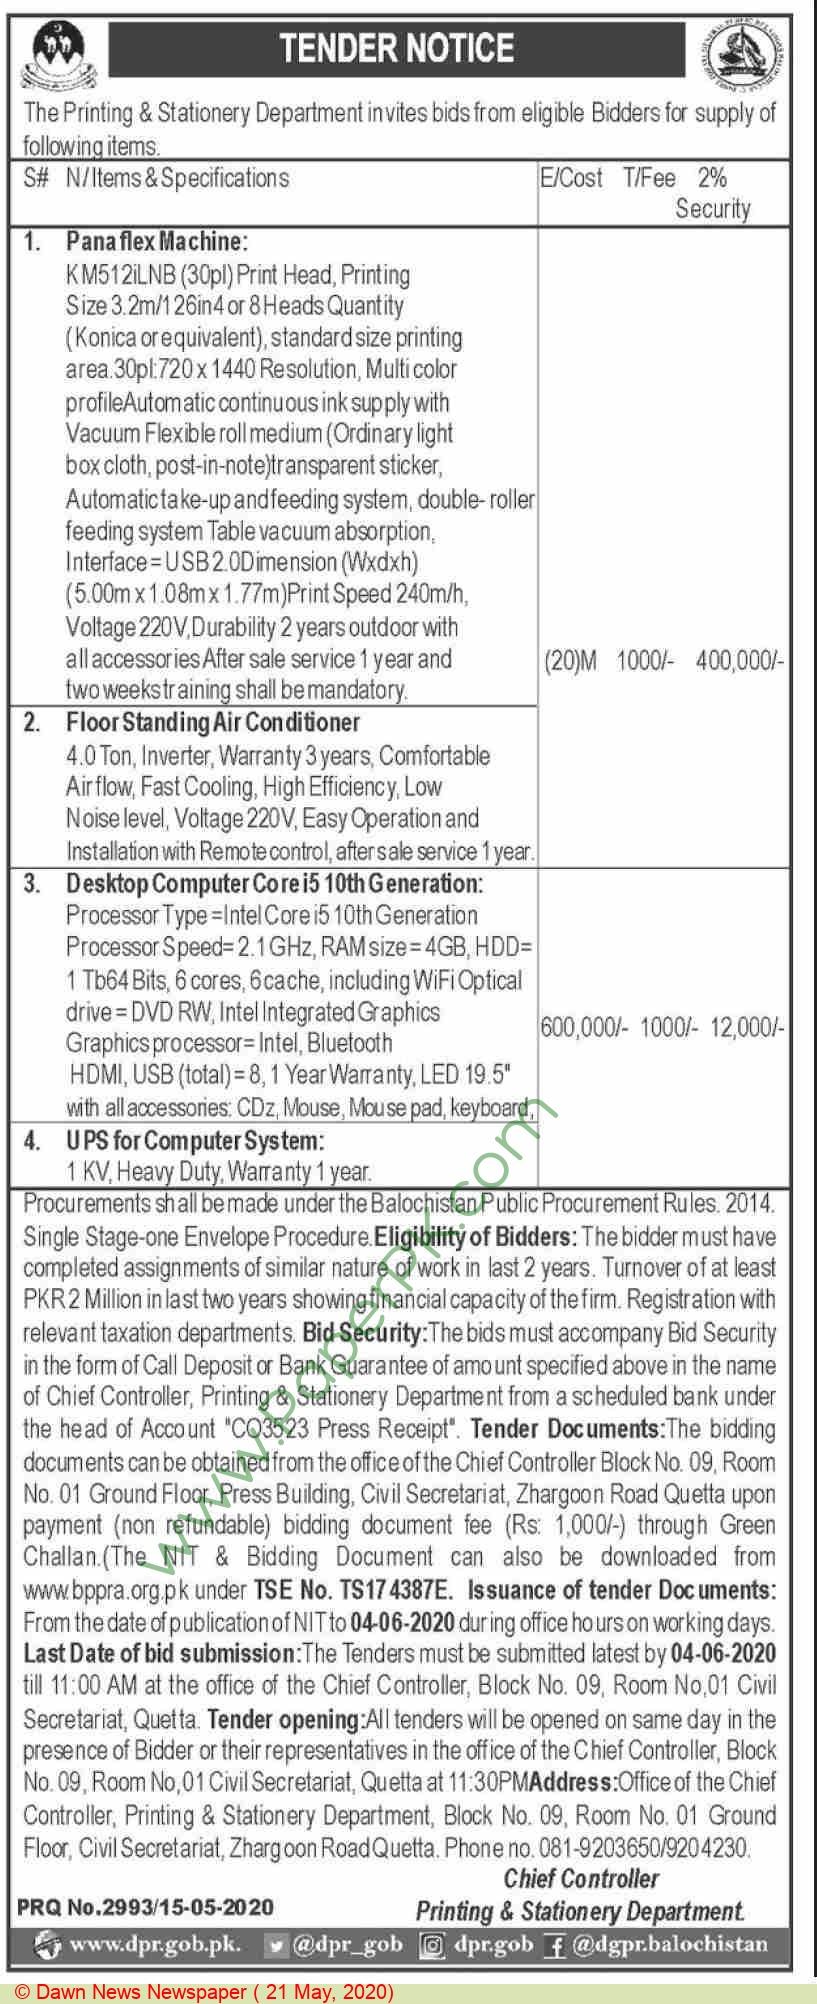 Printing & Stationery Department Karachi Tender Notice